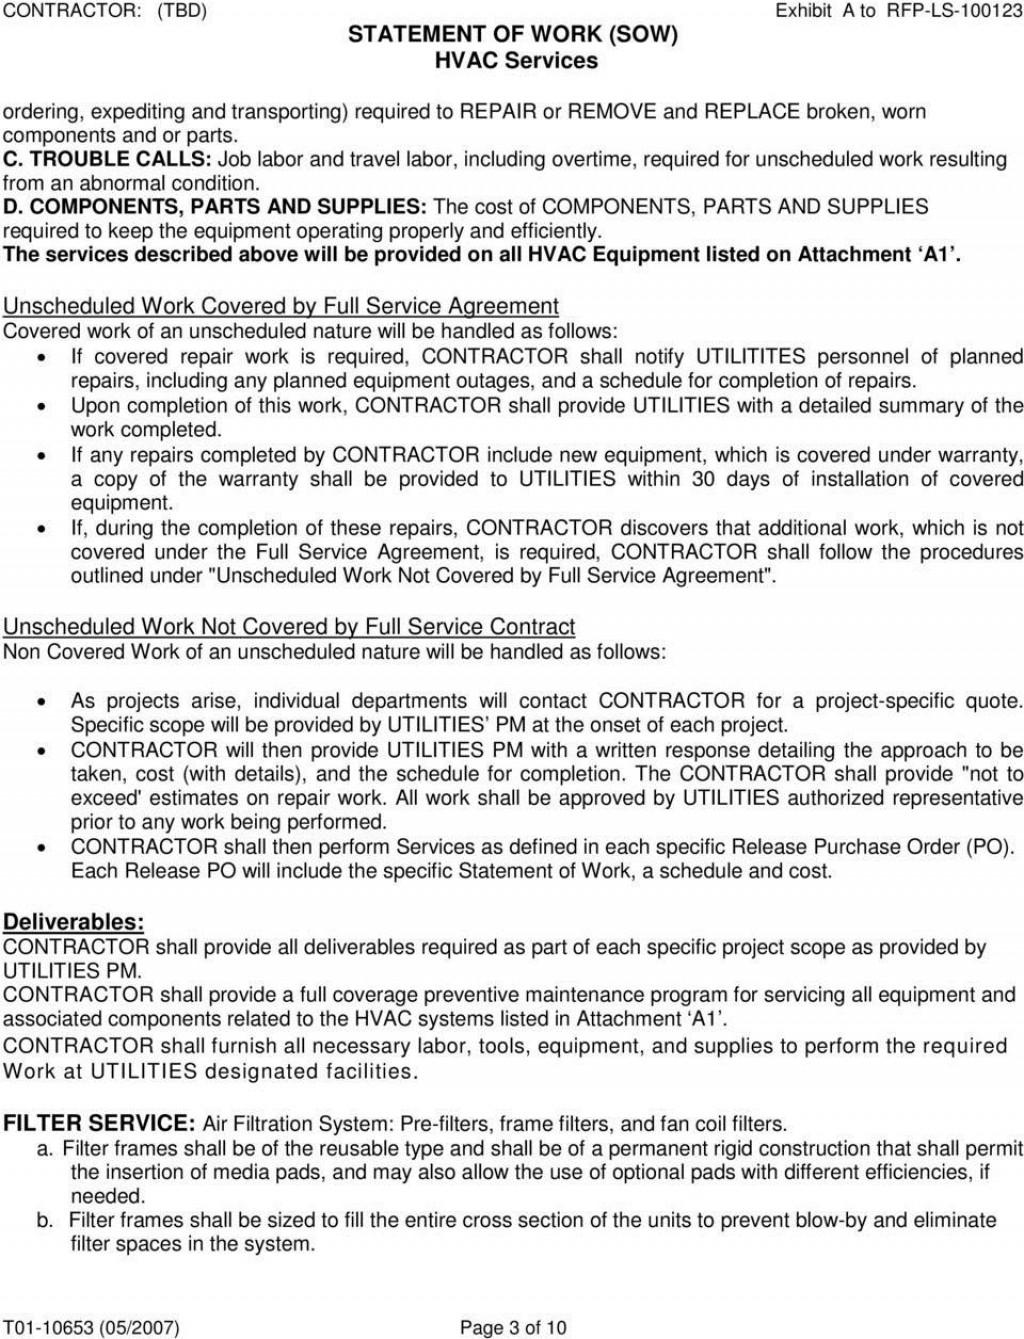 008 Unbelievable Commercial Hvac Service Agreement Template High Resolution  Maintenance ContractLarge